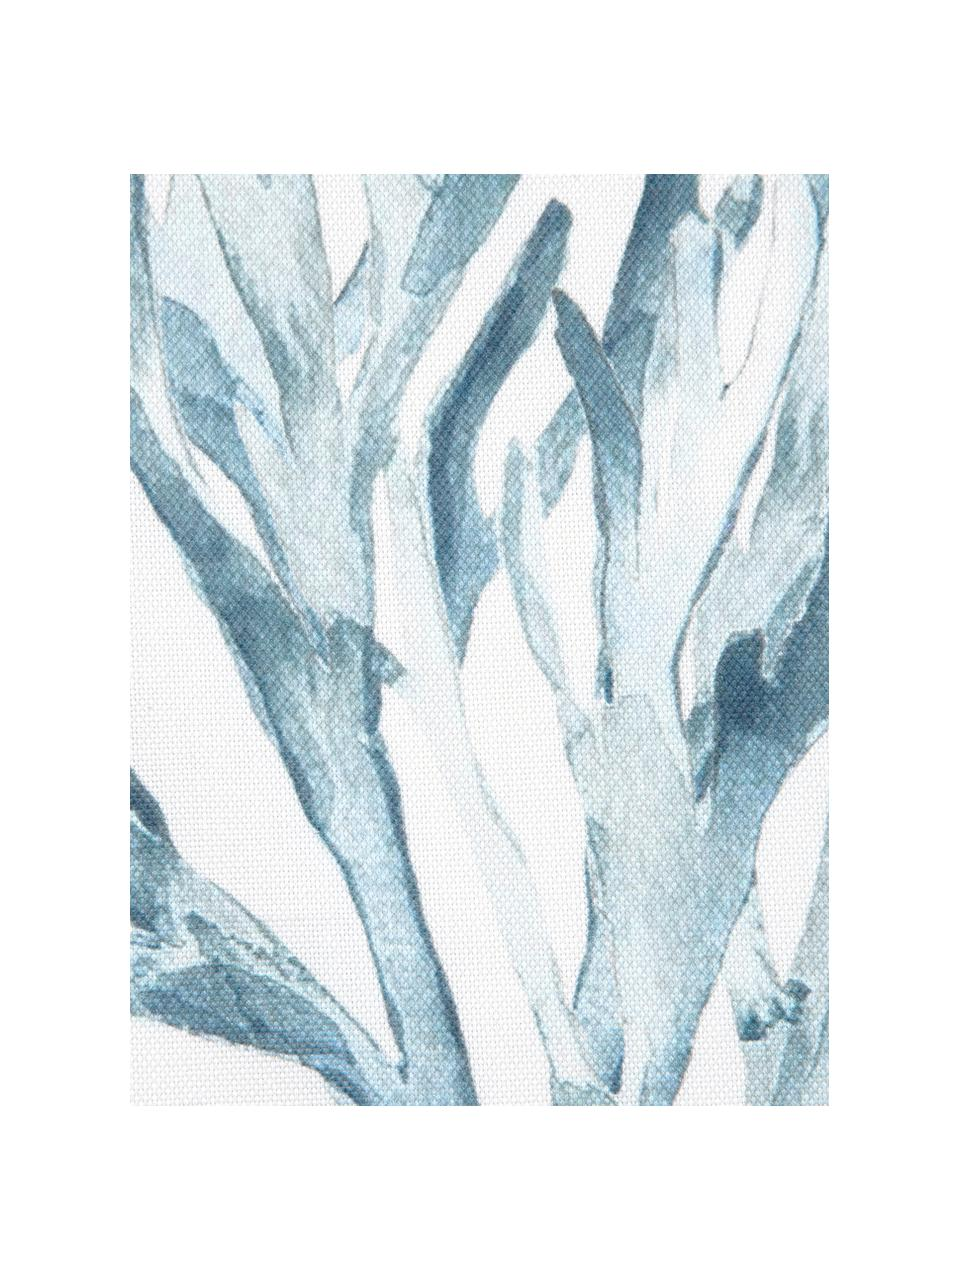 Kissenhülle Asteroidea mit Print in Aquarelloptik, 100% Baumwolle, Blau, Weiß, 40 x 40 cm